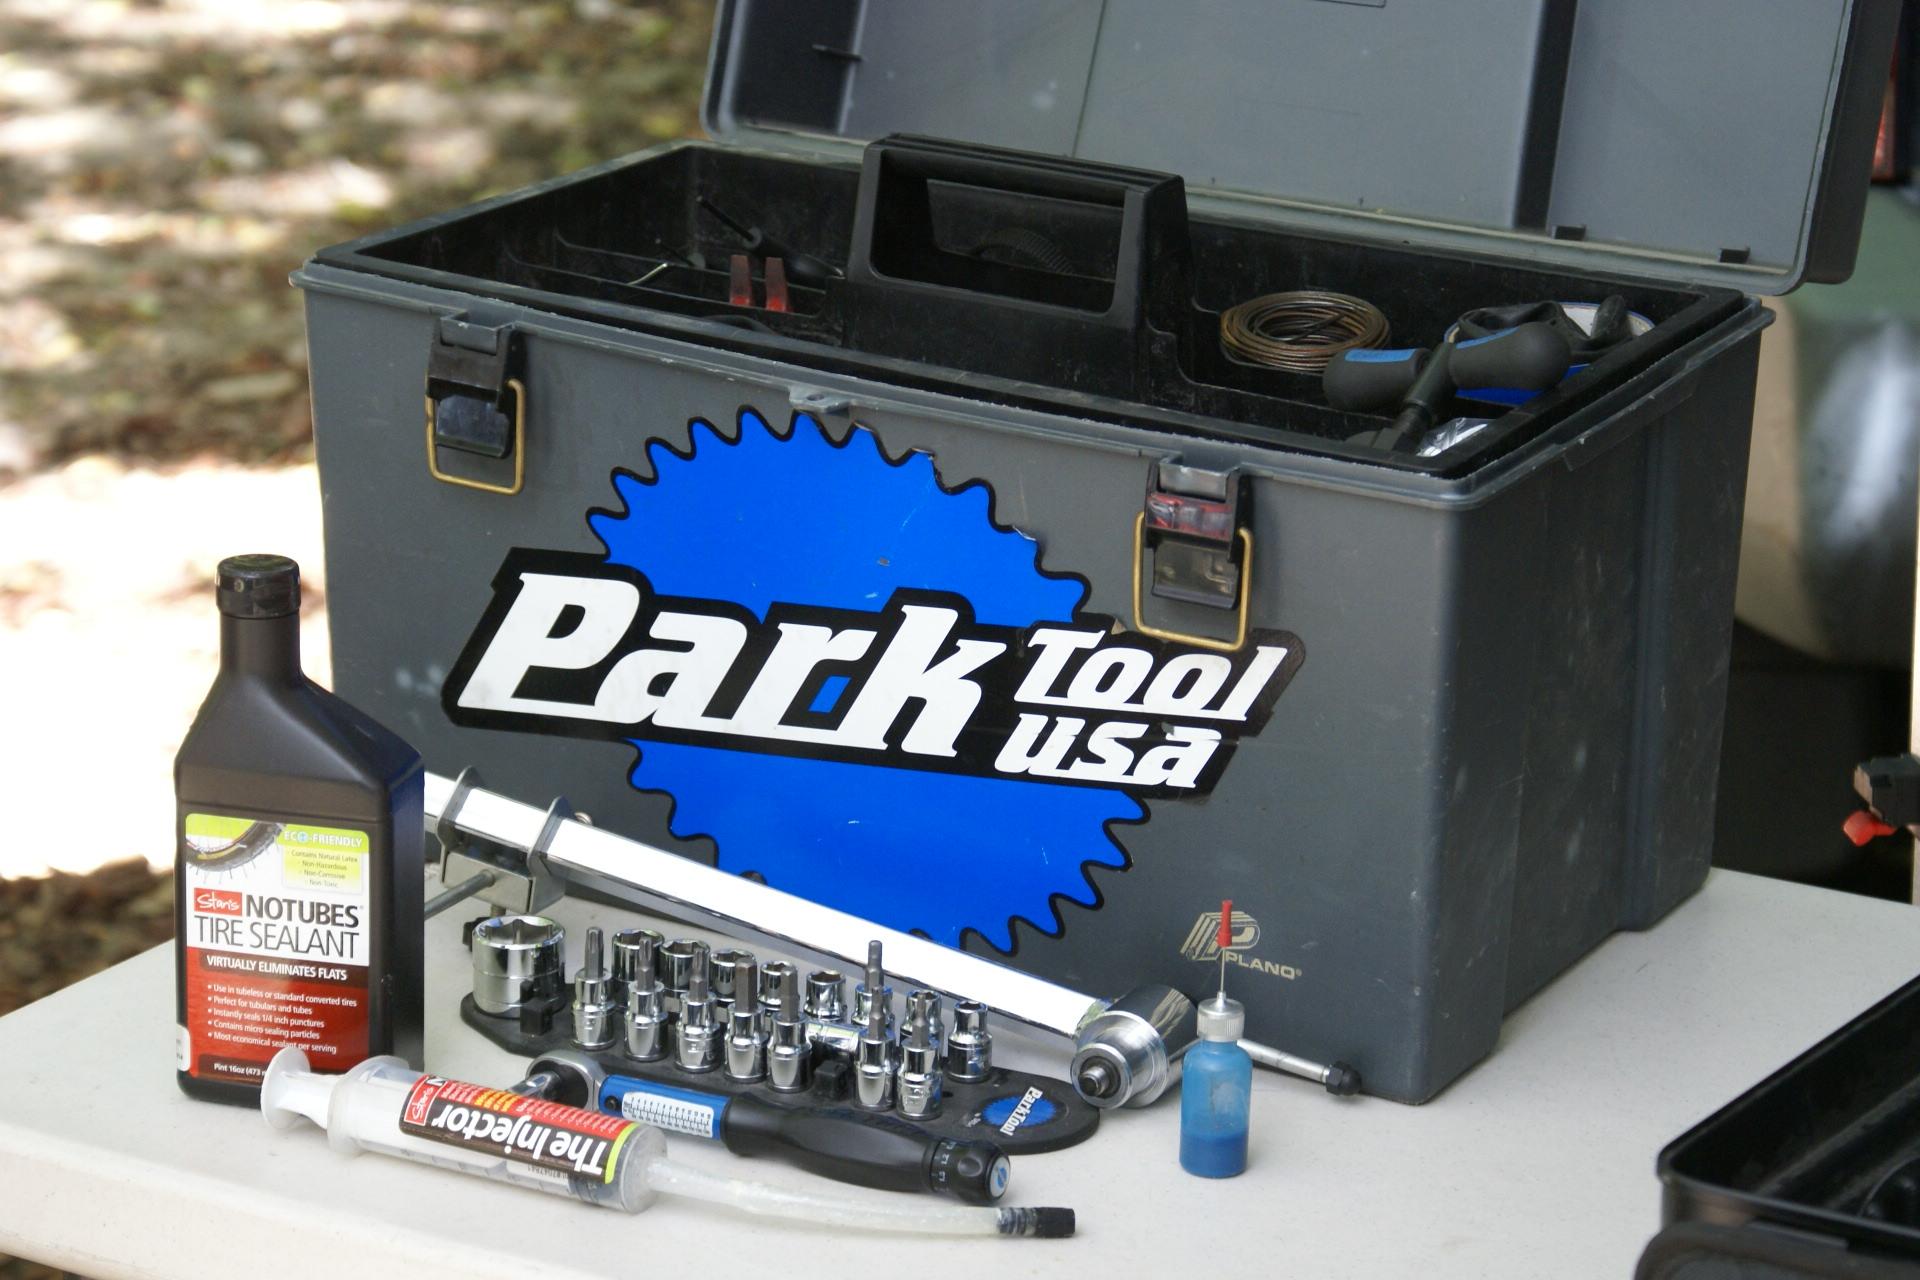 Park tool kit